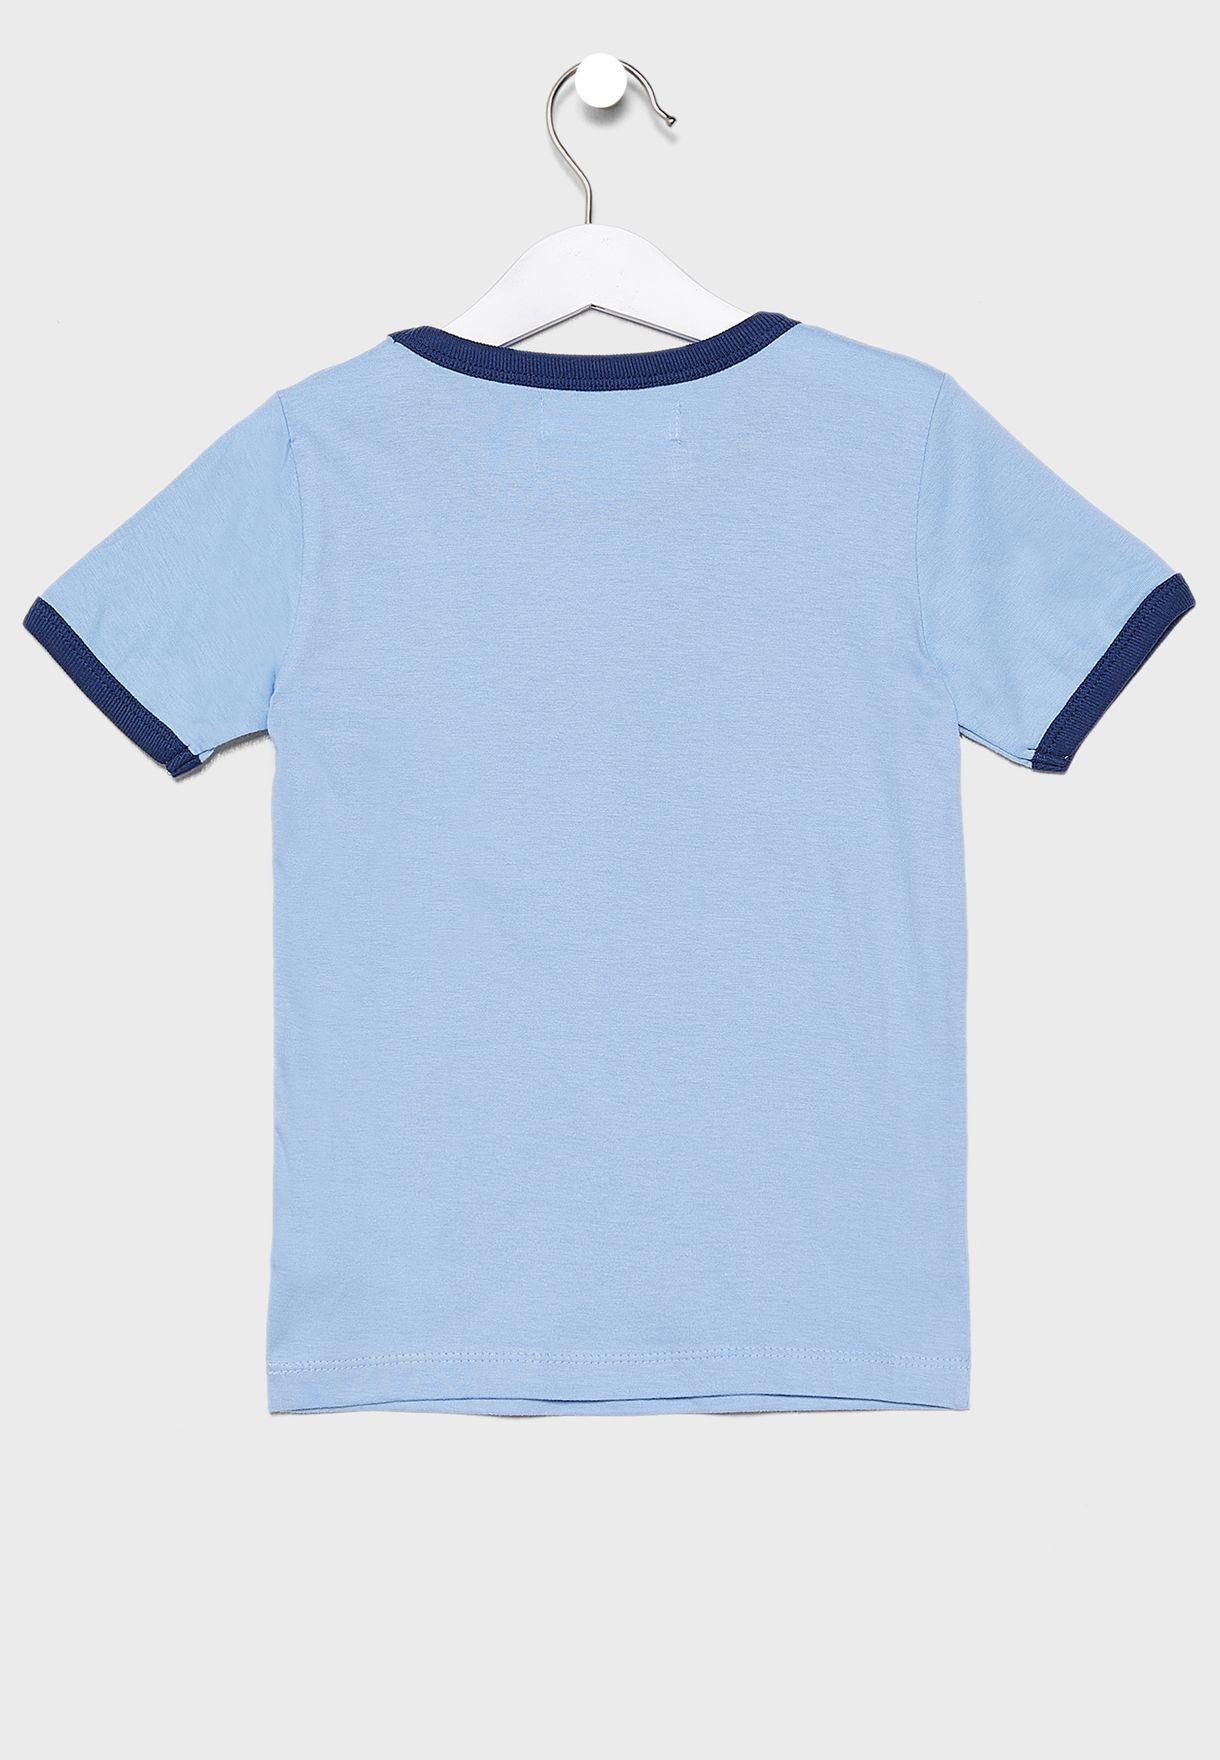 Teen Graphic Ringer T-Shirt